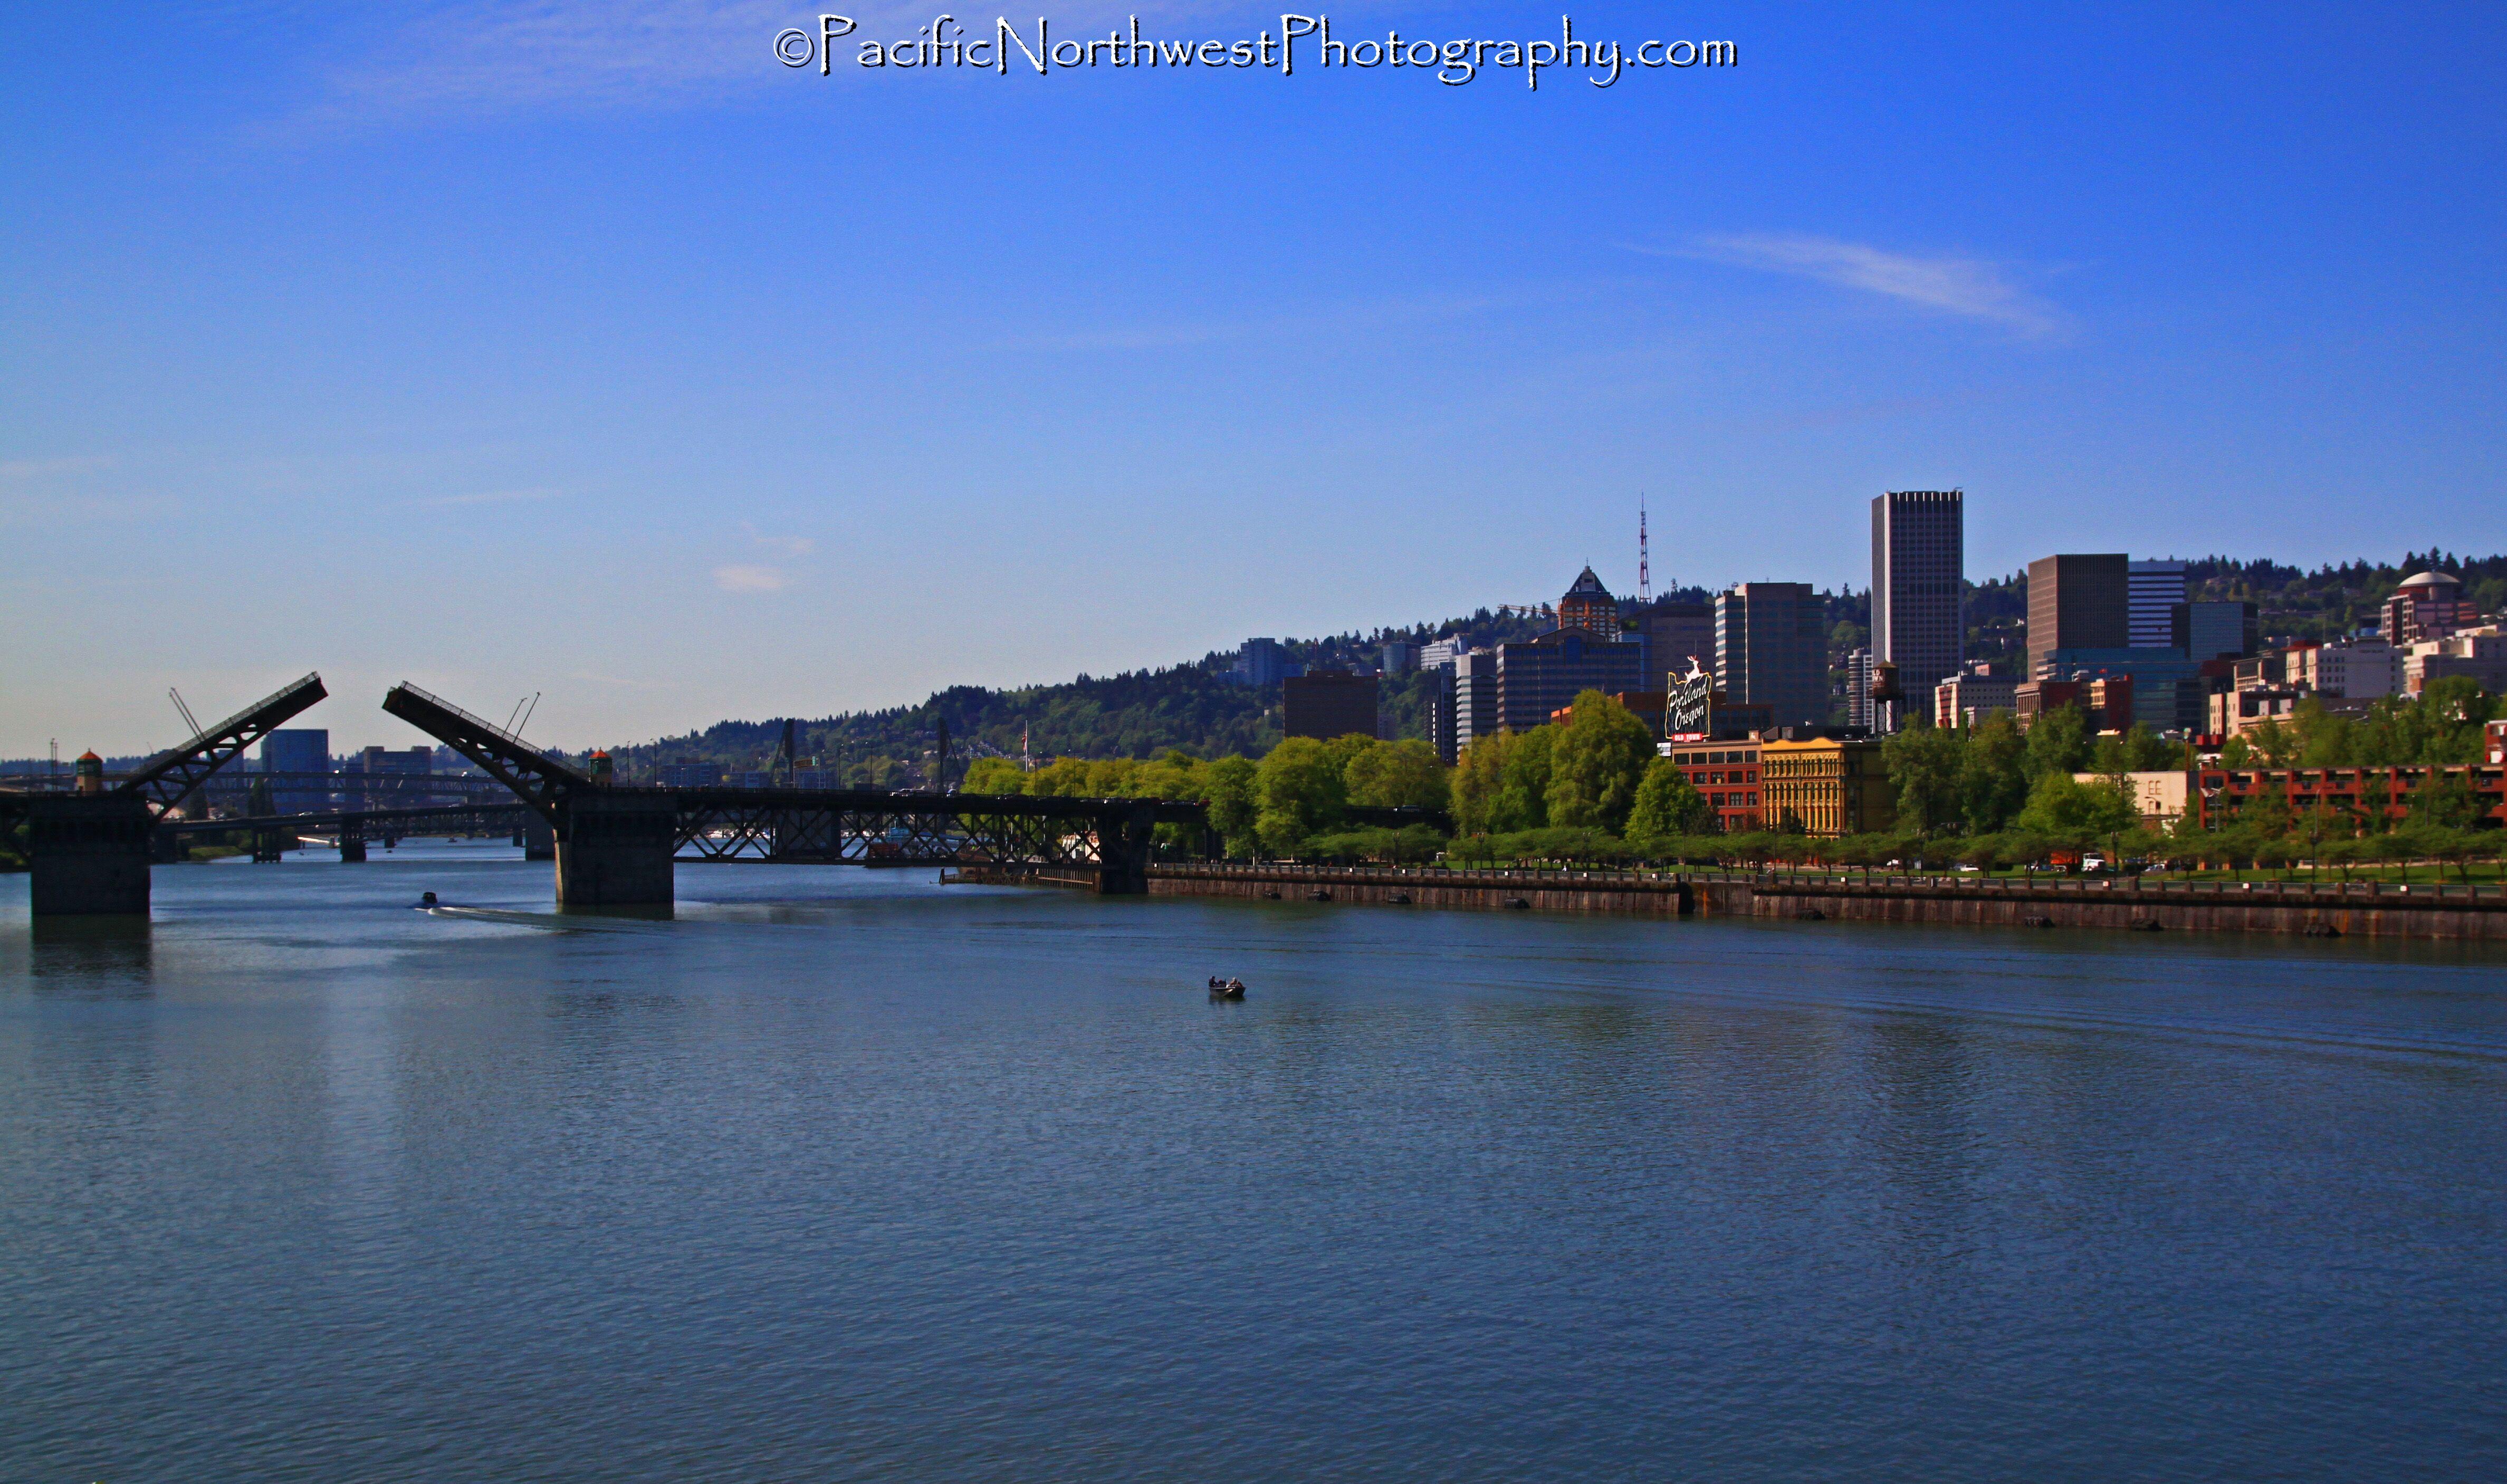 Bridge, river and city